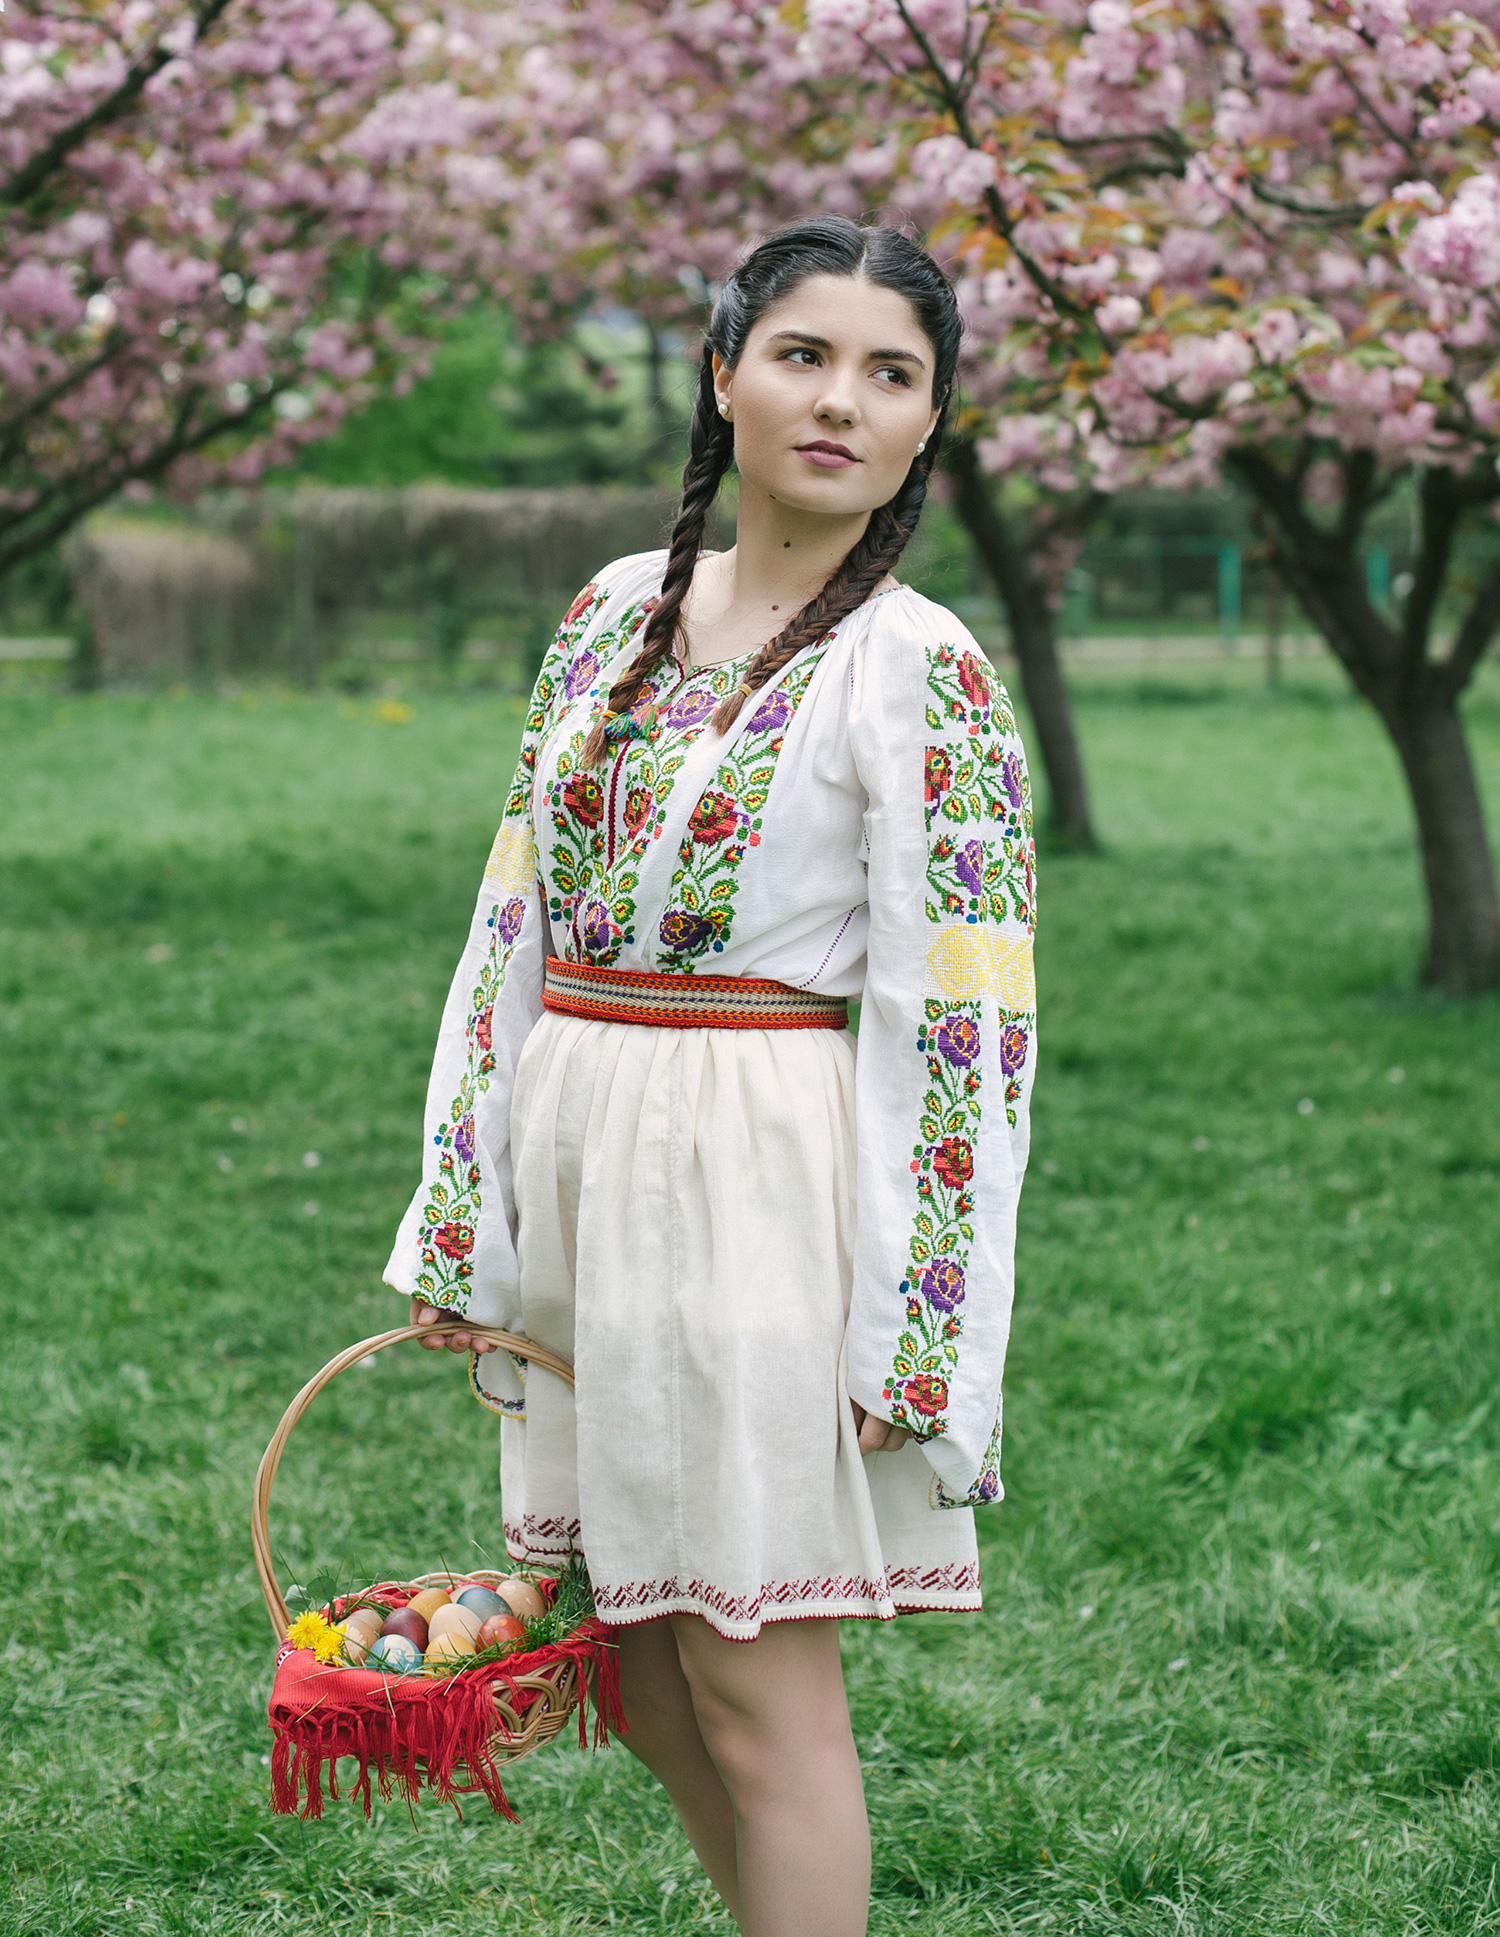 fotograf profesionist, costum popular traditional romanesc, femeie romanaca in costum popular, portret ie romaneasca, ia romaneasca, sedinta foto femeie portret